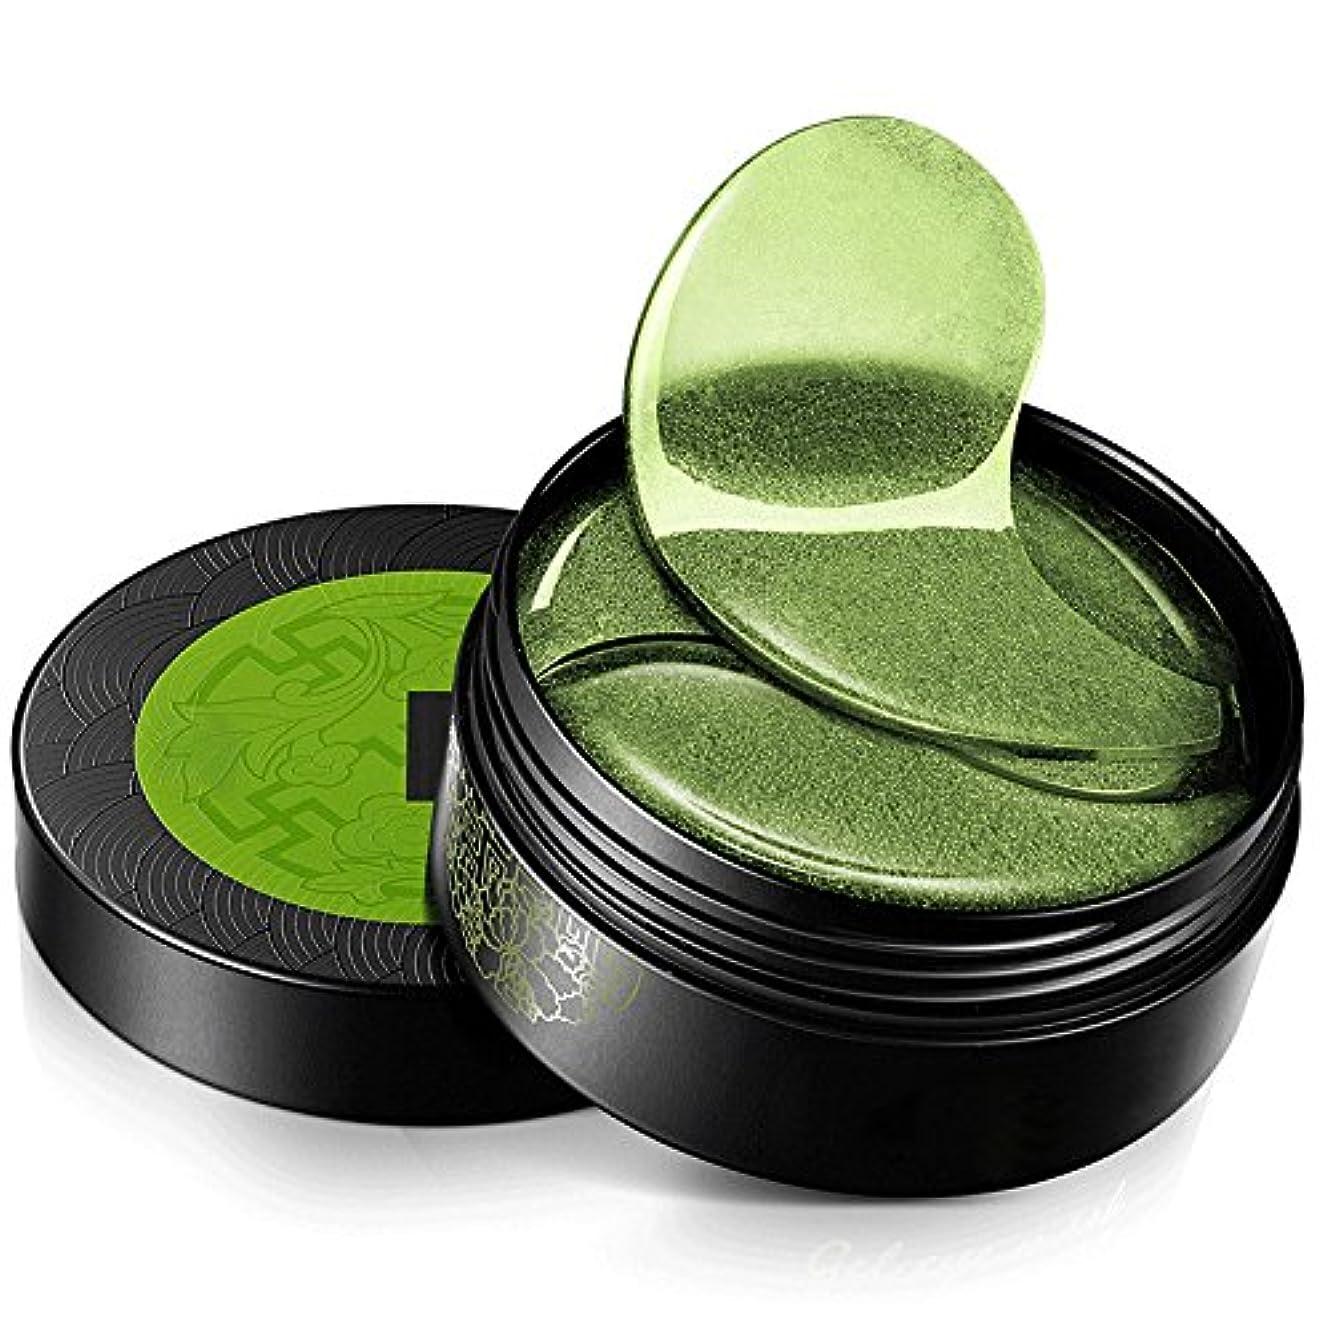 LULAA MEIKING 目元シート 目元パック 海藻成分 超浸透 潤い 保湿 しわ 浮腫 目くま ヒアルロン酸 天然 抗過敏 緑